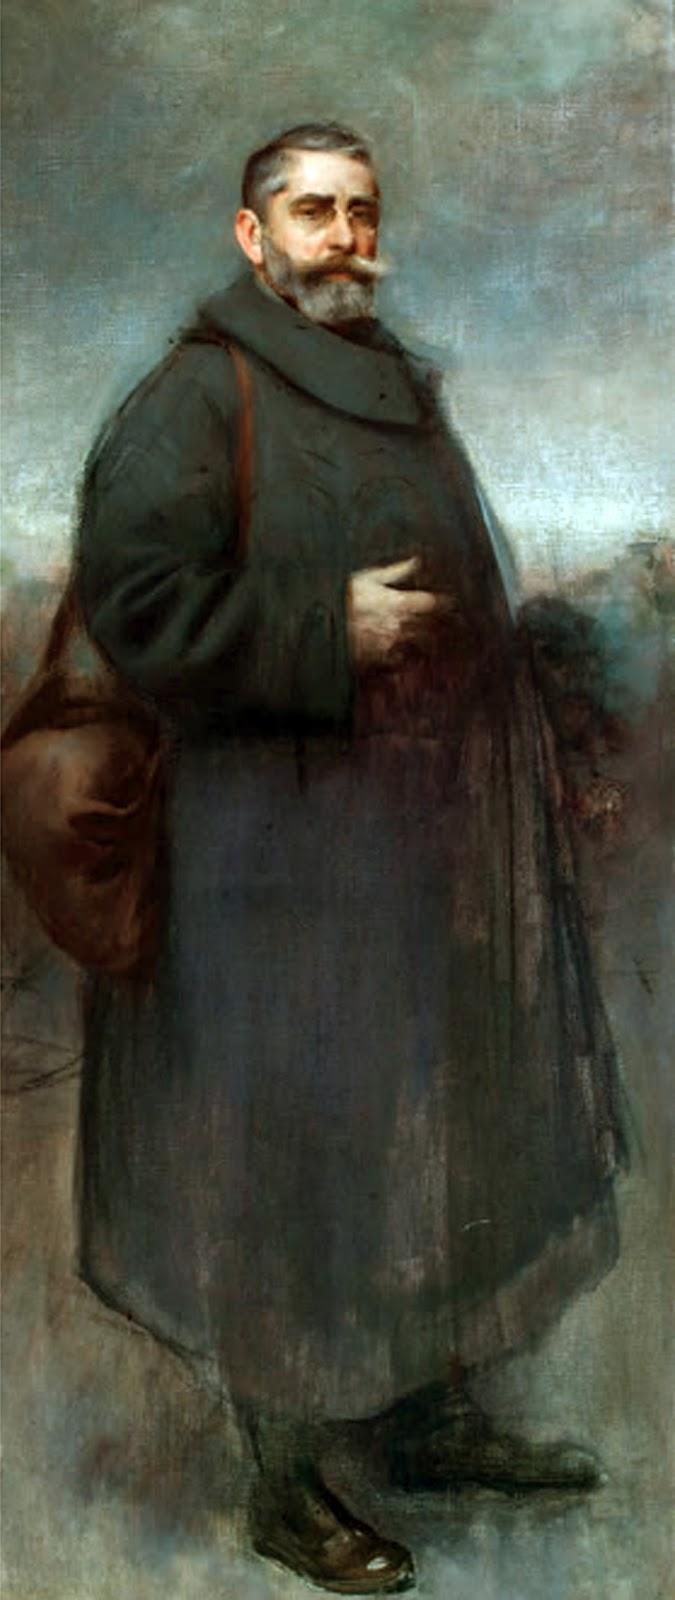 Ramón Casas i Carbó, Galería de autorretratos, Pintor español, Pintura española,  Pintores Realistas Españoles,  Galería de retratos Figurativos, Retratos de  Ramón Casas i Carbó